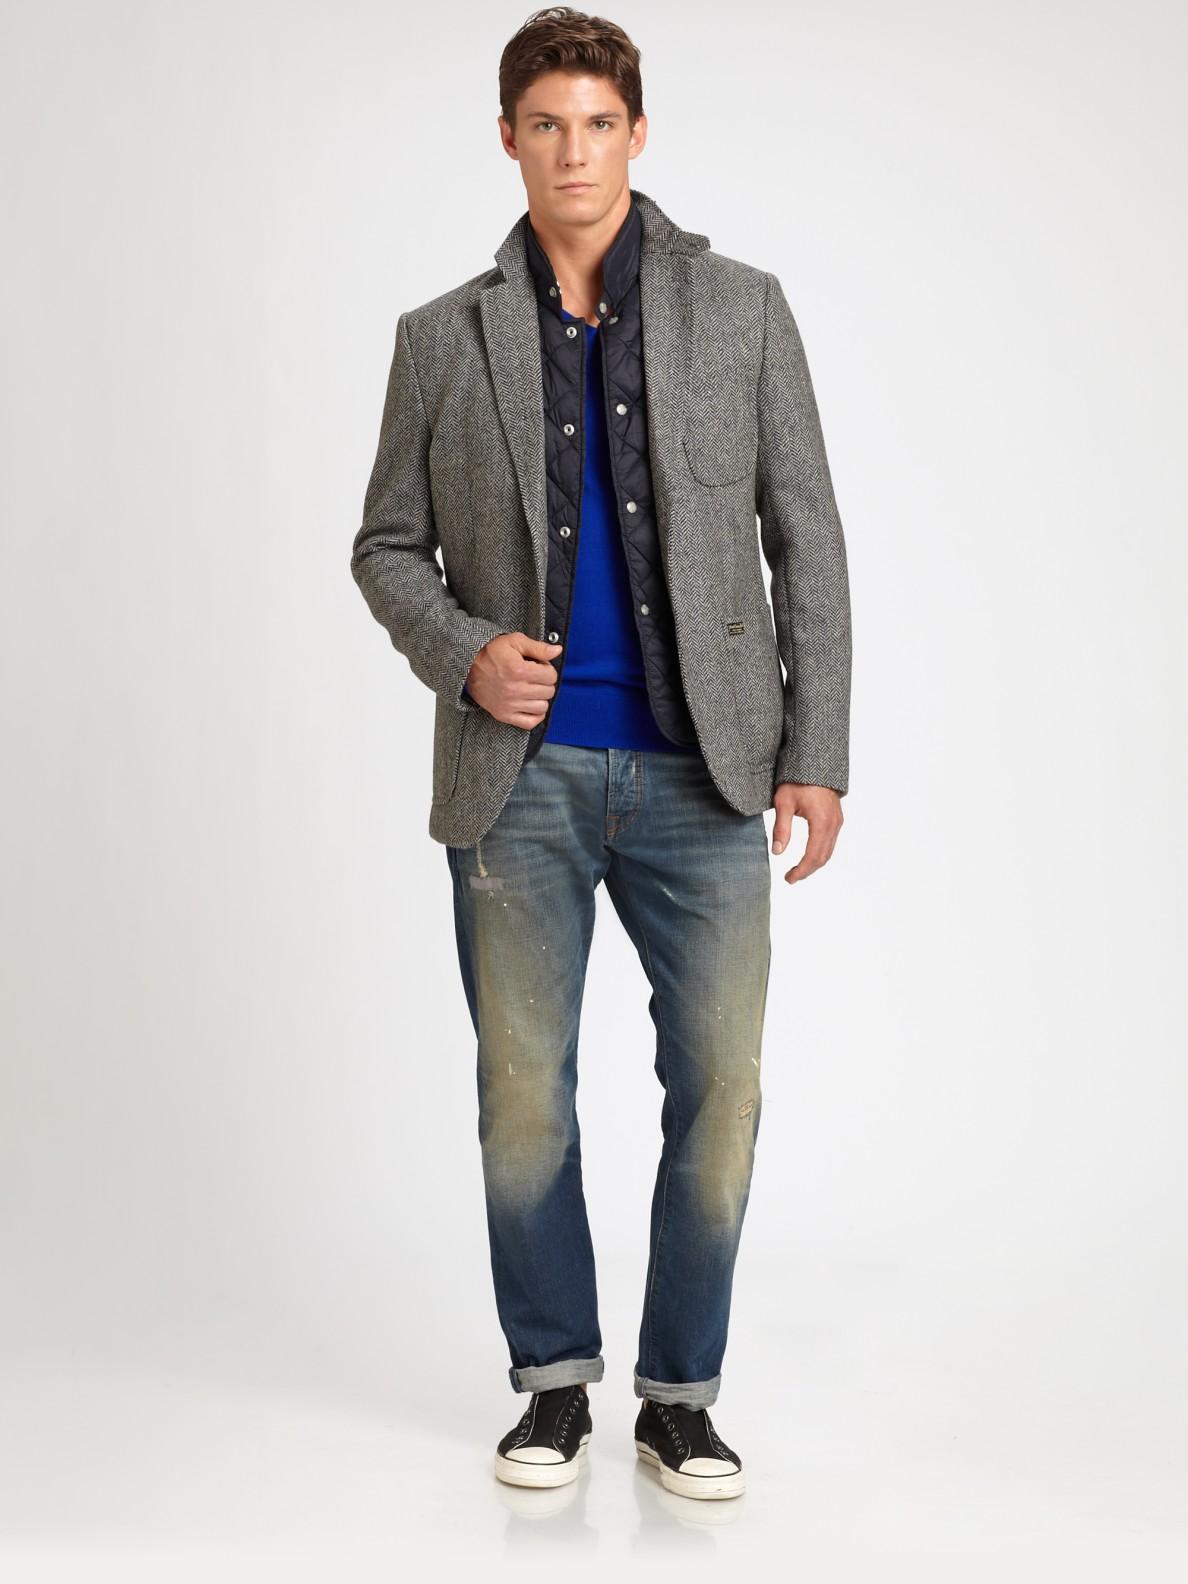 Scotch Amp Soda Herringbone Blazer In Grey Gray For Men Lyst